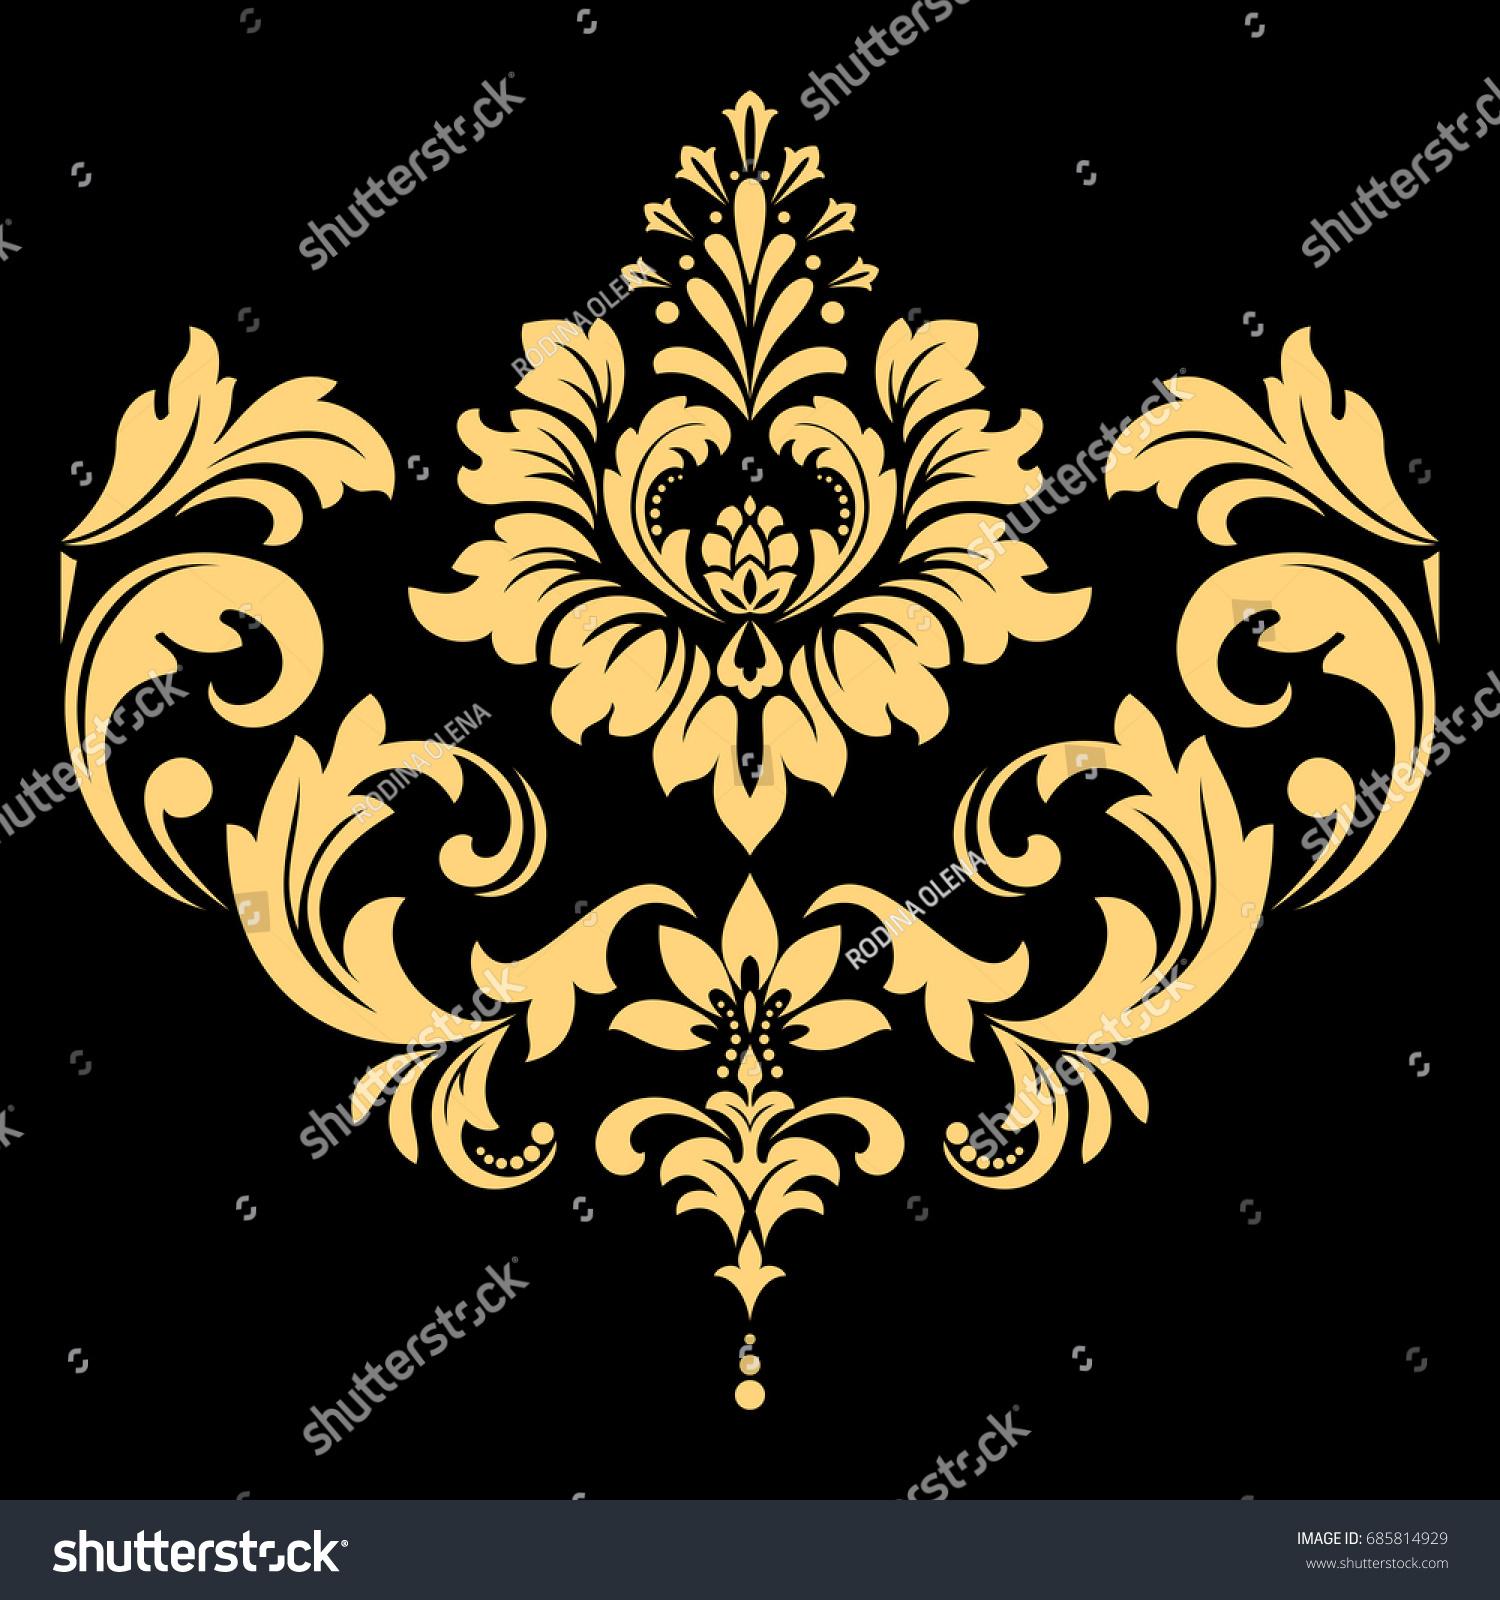 Golden Pattern On Black Background Damask Stock Illustration 685814929